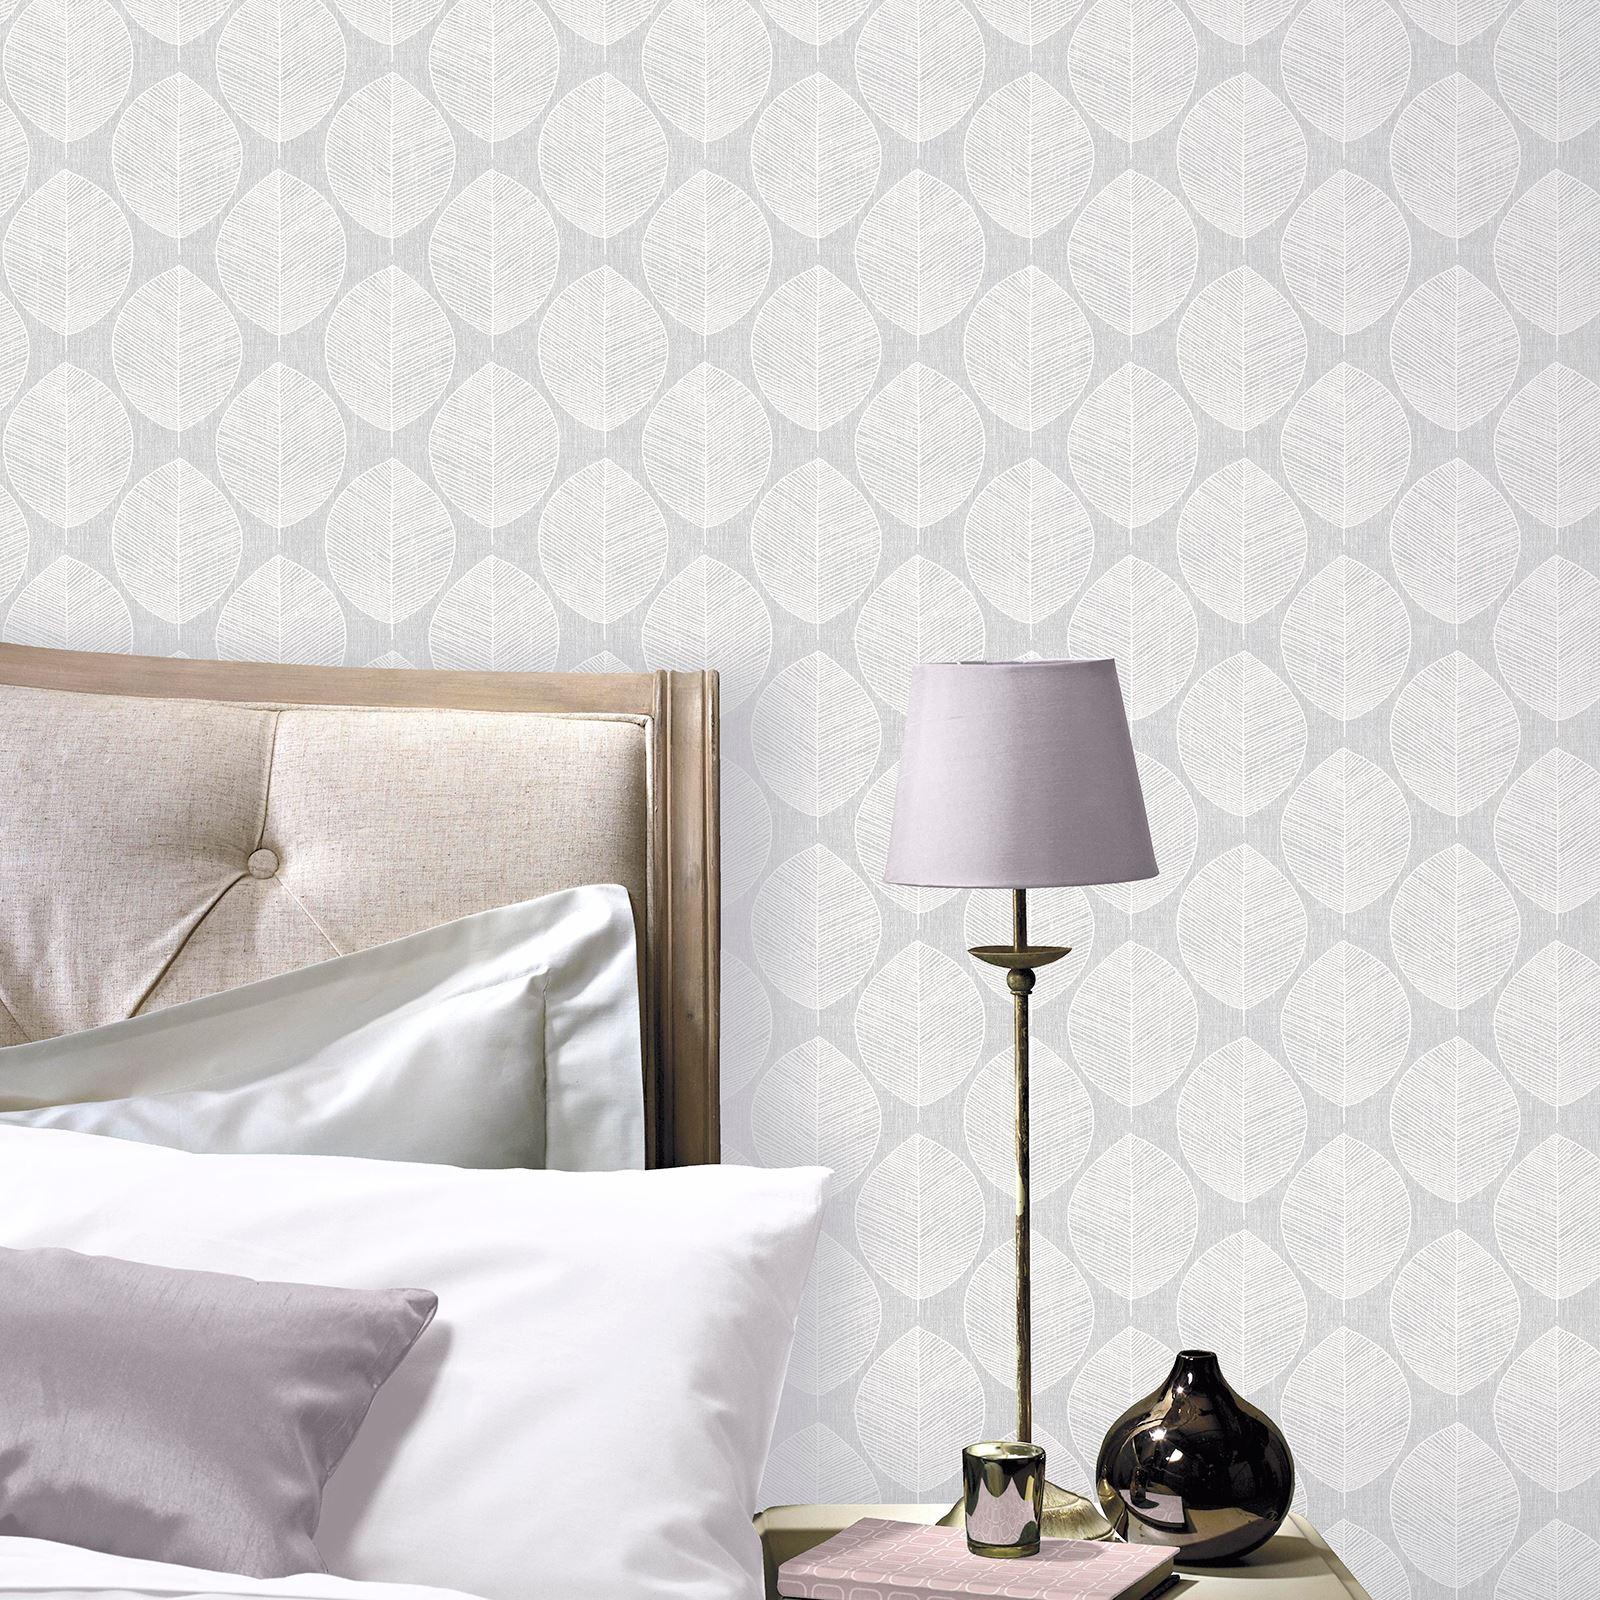 Indexbild 3 - Arthouse Scandi Blatt Tapete - Grau Rosa Blaugrün Schlafzimmer Flur Lounge